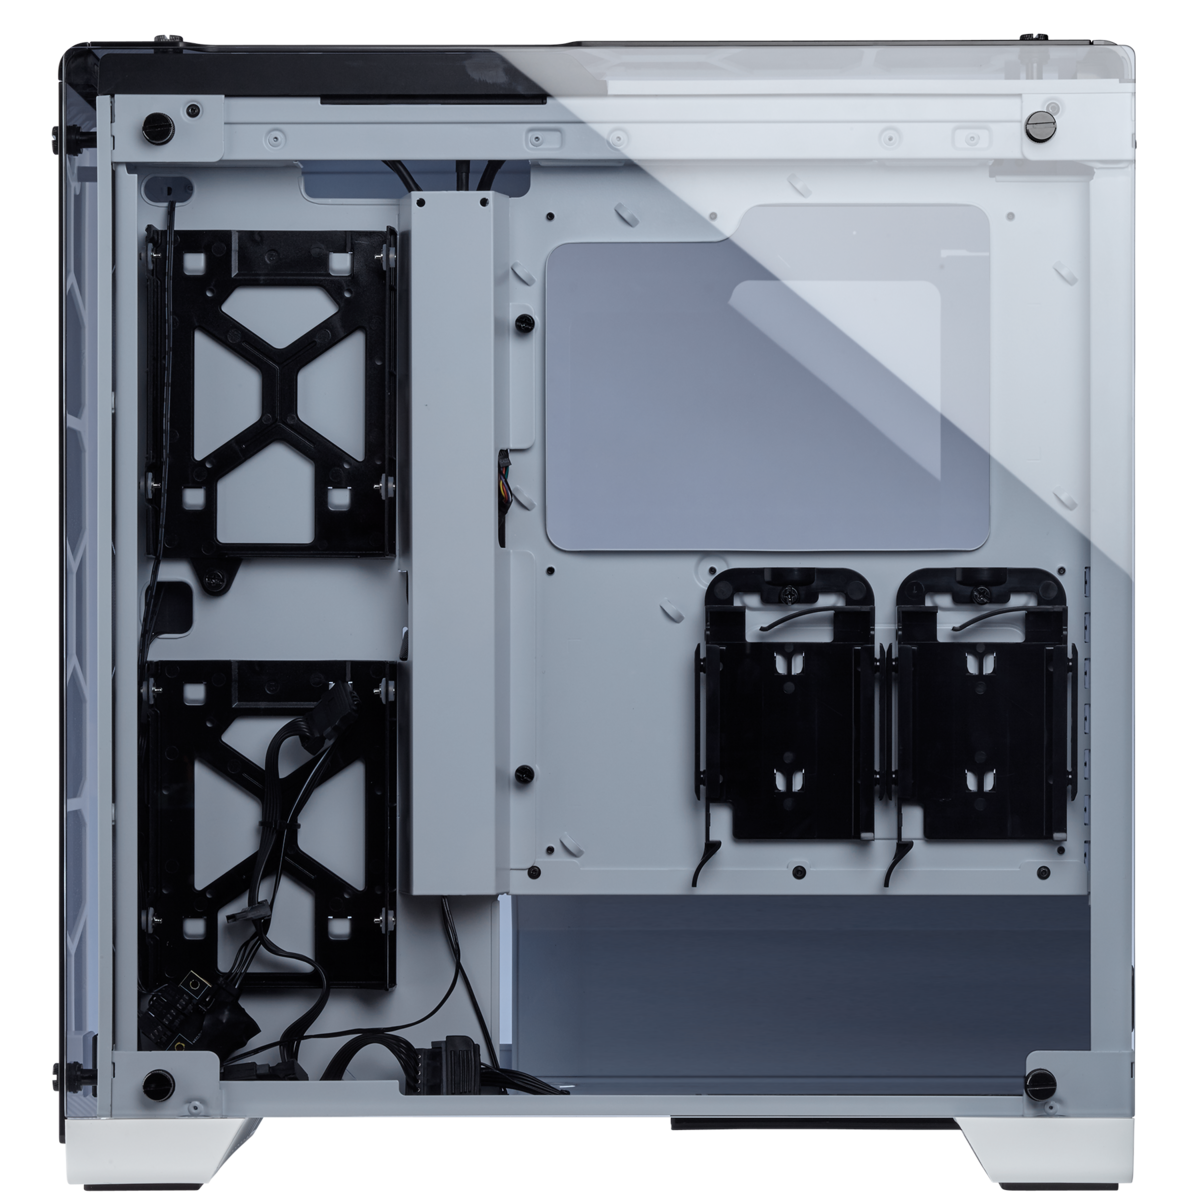 Corsair Desktop Casing Crystal Series 570X RGB – Tempered Glass, Premium ATX Mid-Tower Case (843591097260) (CC-9011110-WW) (White), Three SP120 RGB LED fans, 4-Panel Tempered Glass Panels, Direct Airflow Path design